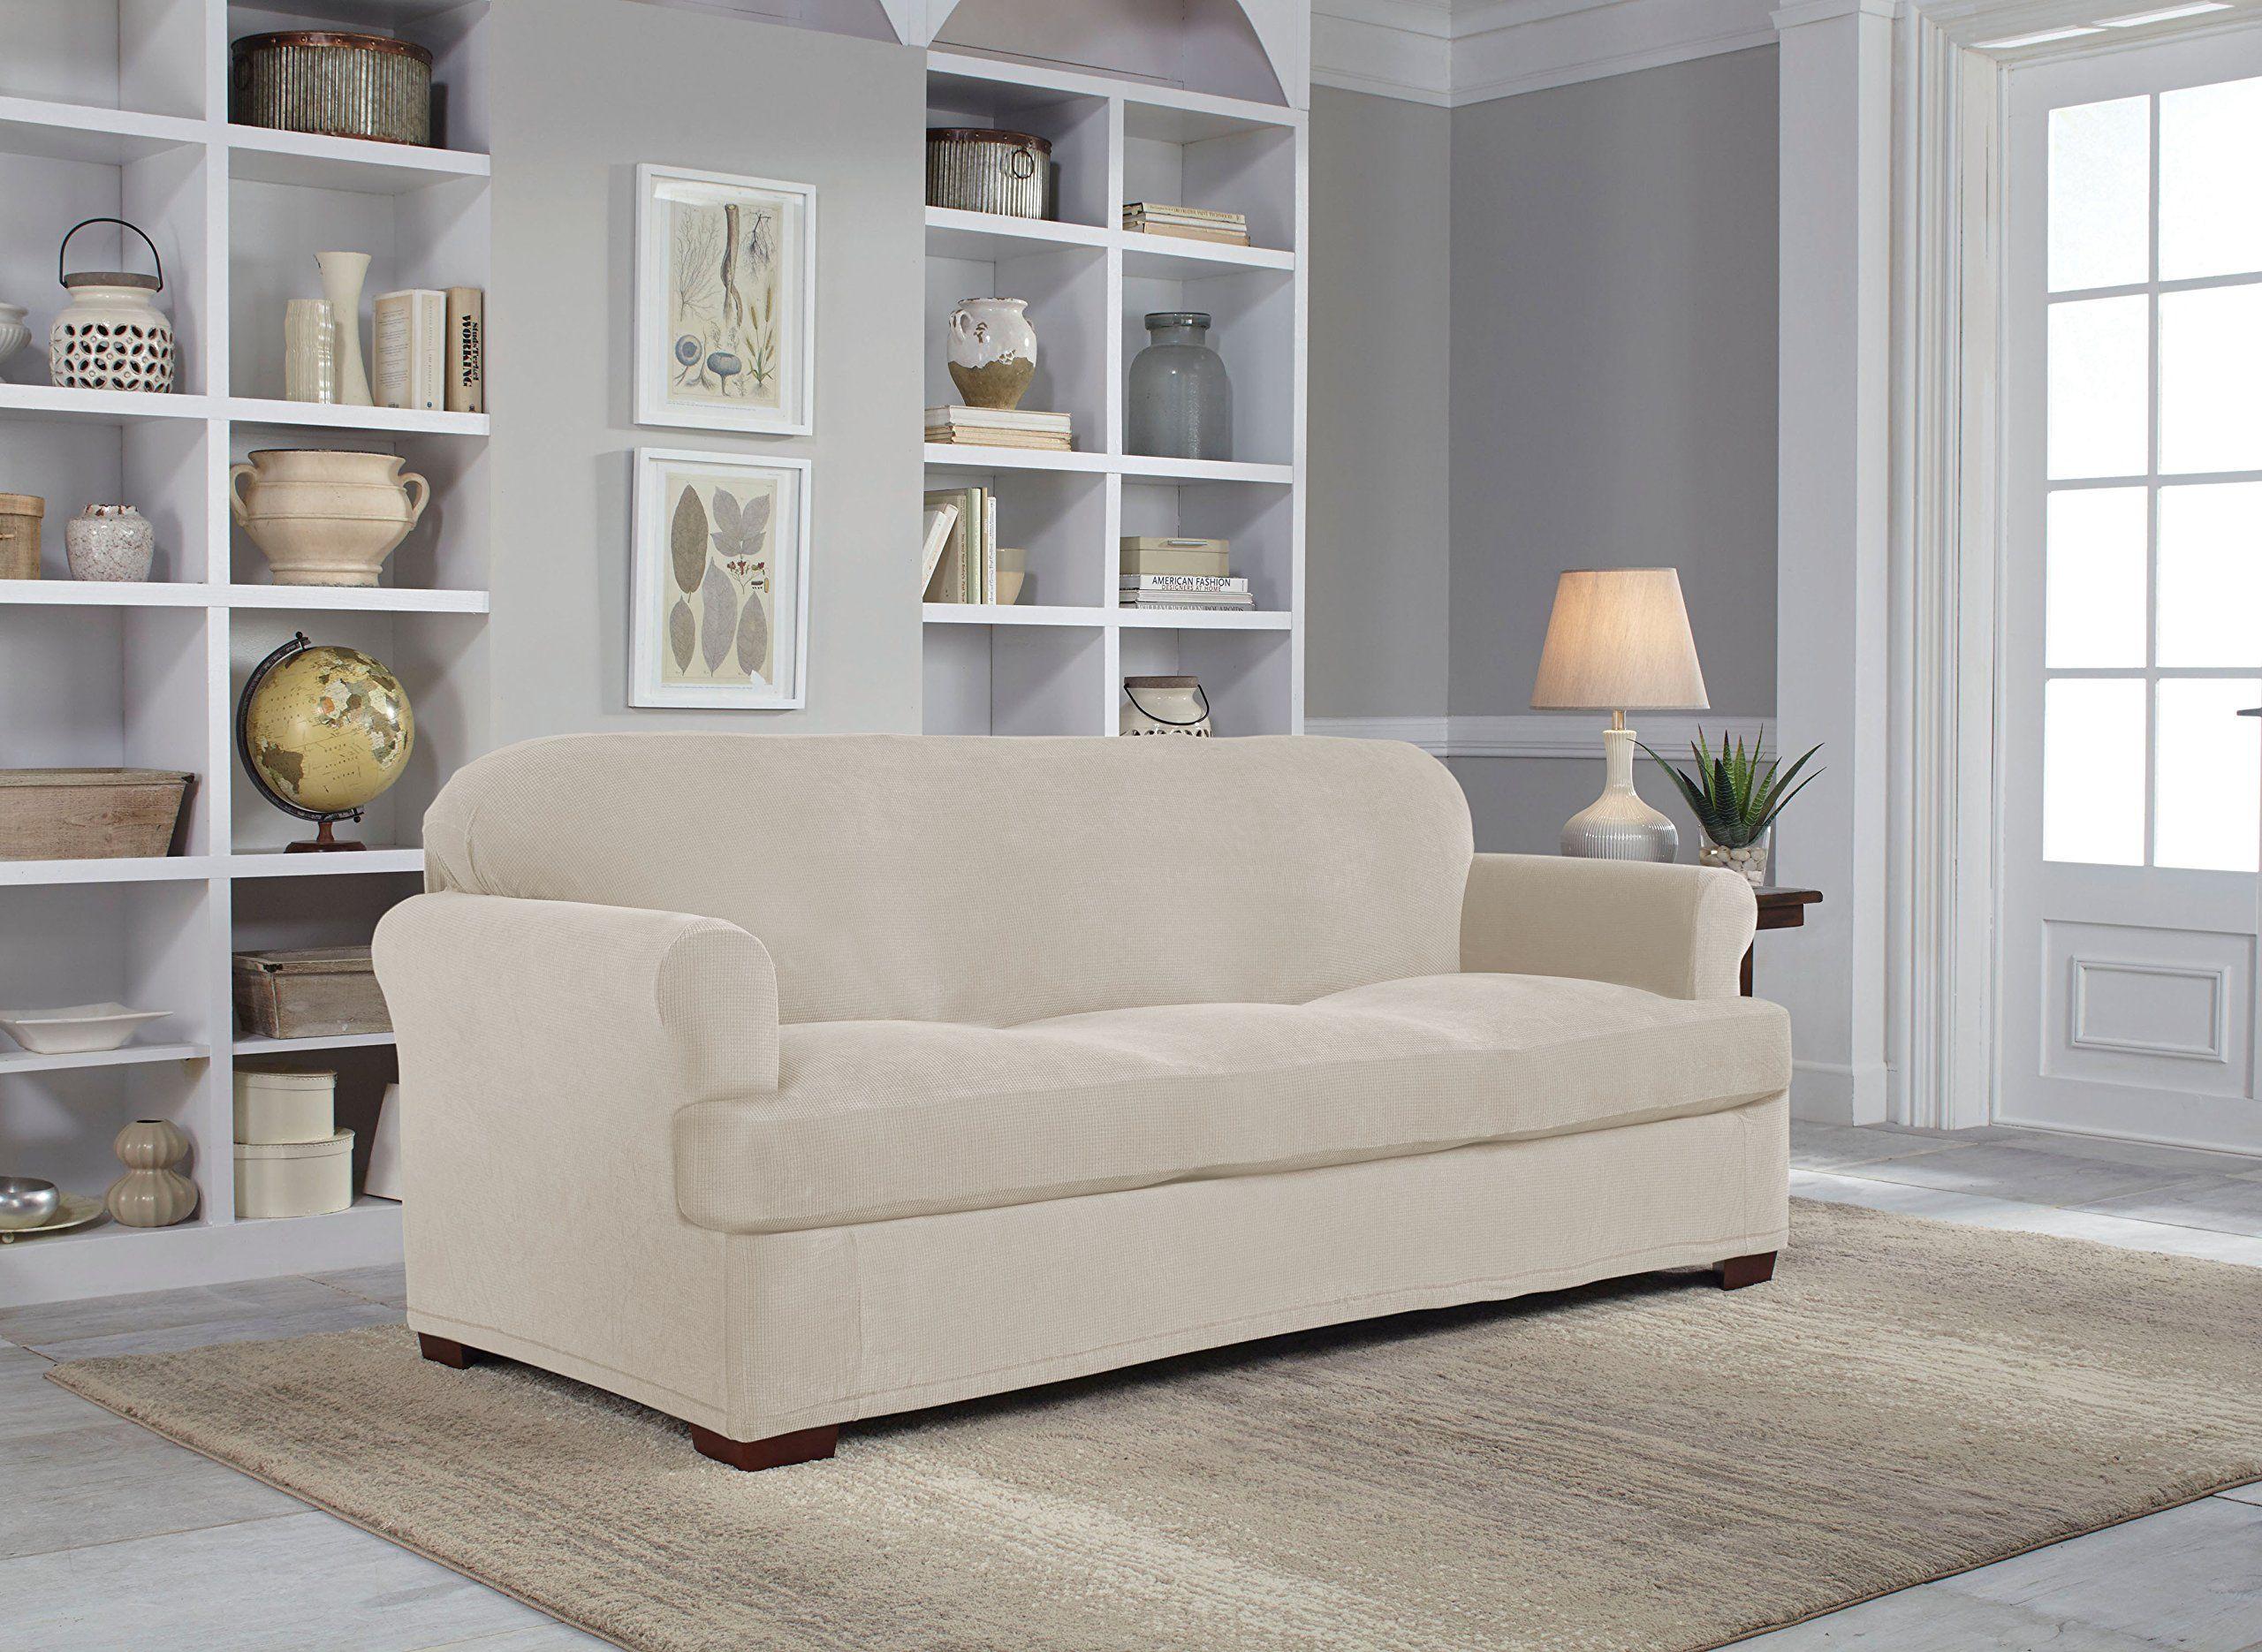 Serta 2 Piece Stretch Grid T Sofa Slipcover Putty * Read